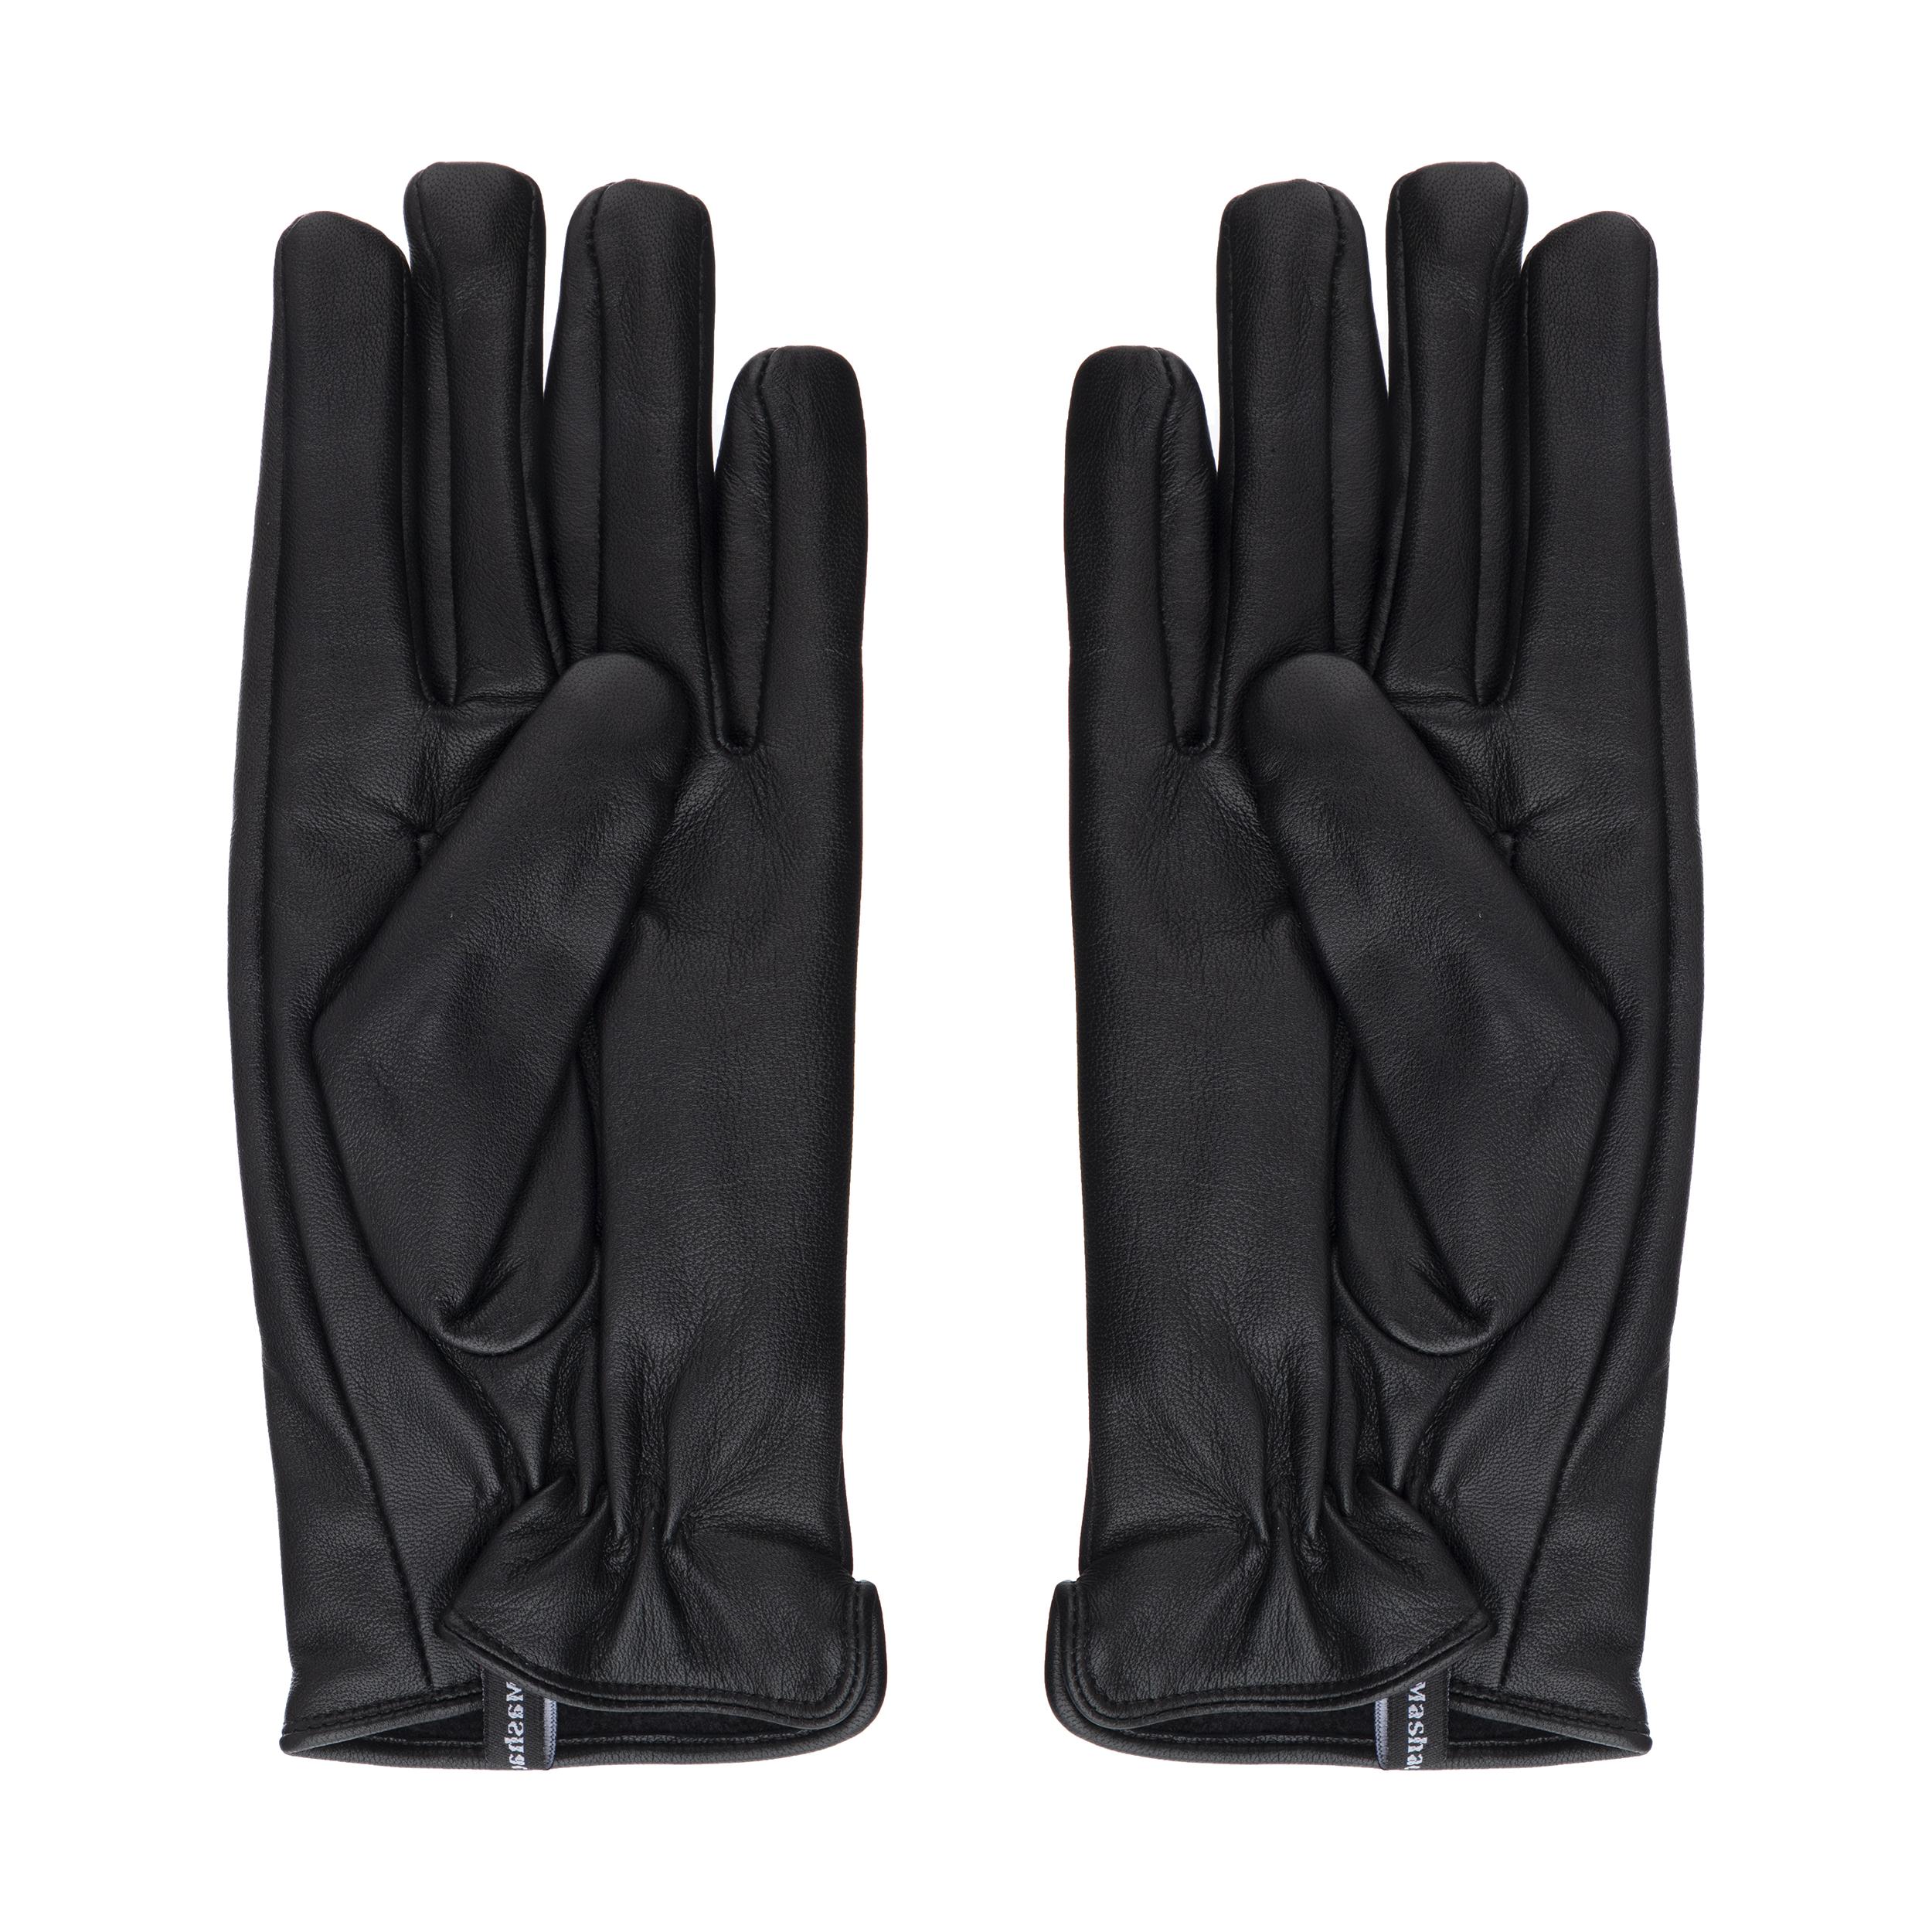 دستکش مردانه چرم مشهد مدل R0534-001